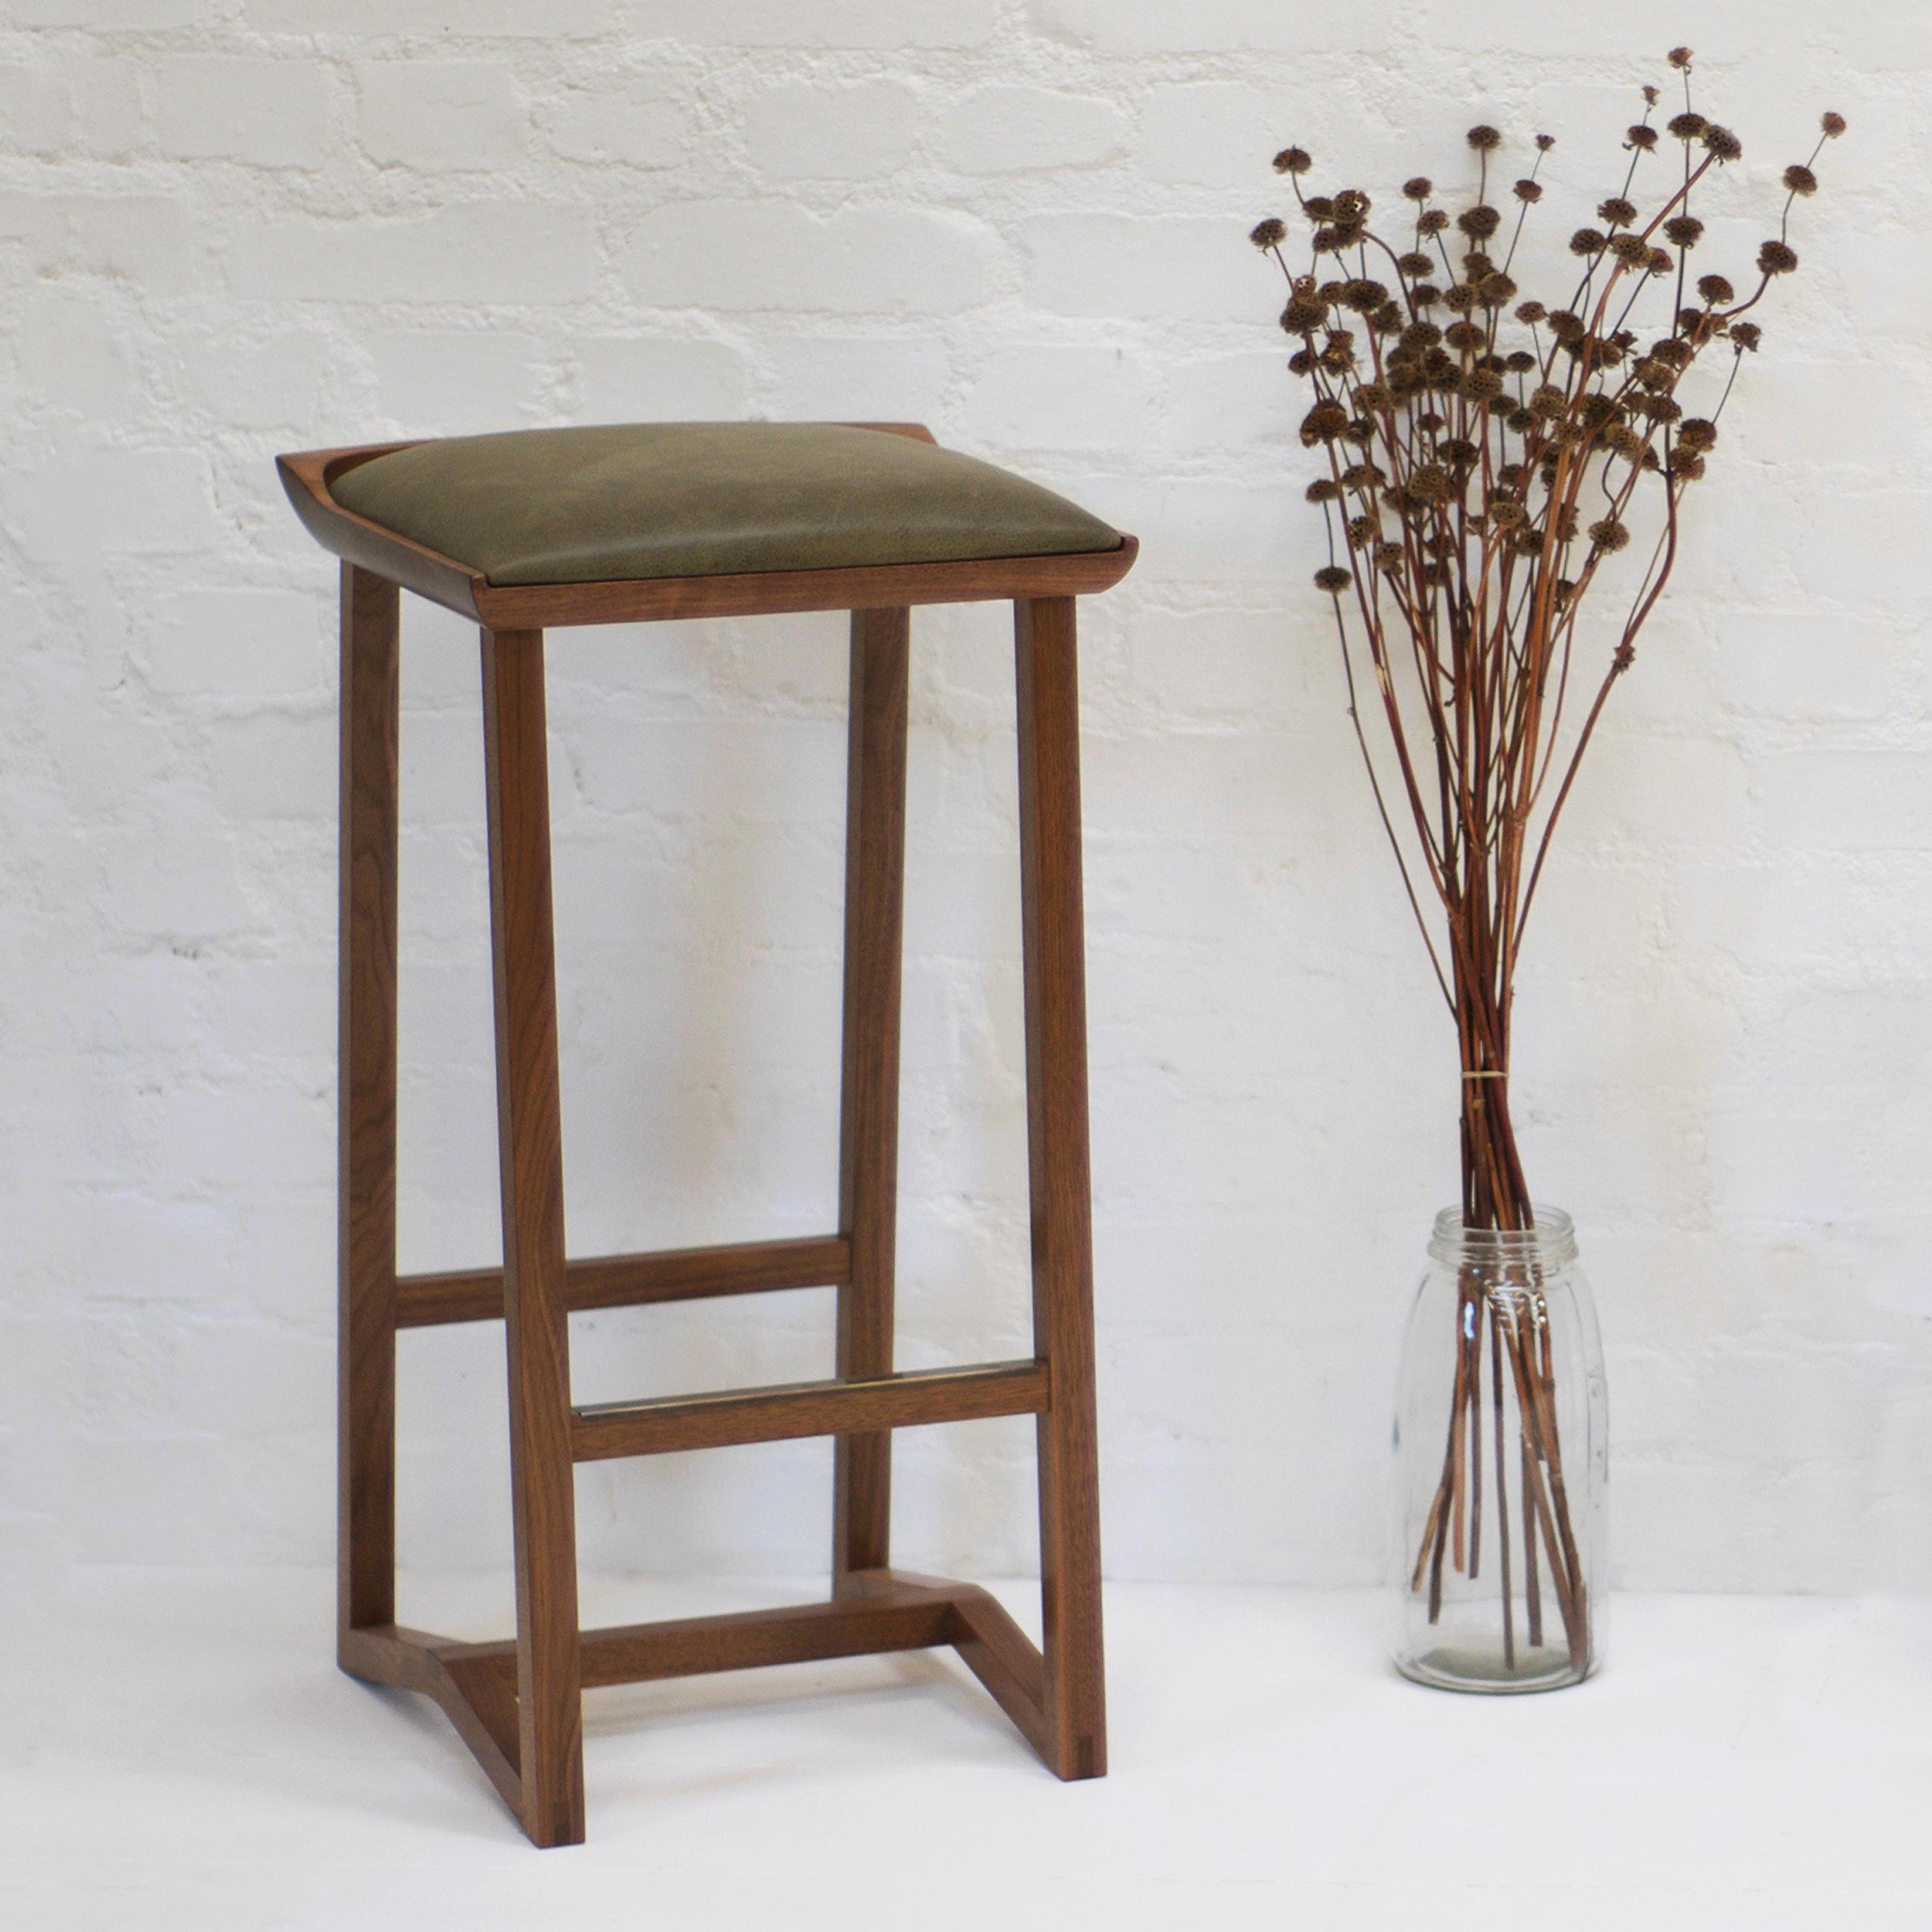 tasgal stool 1.jpg